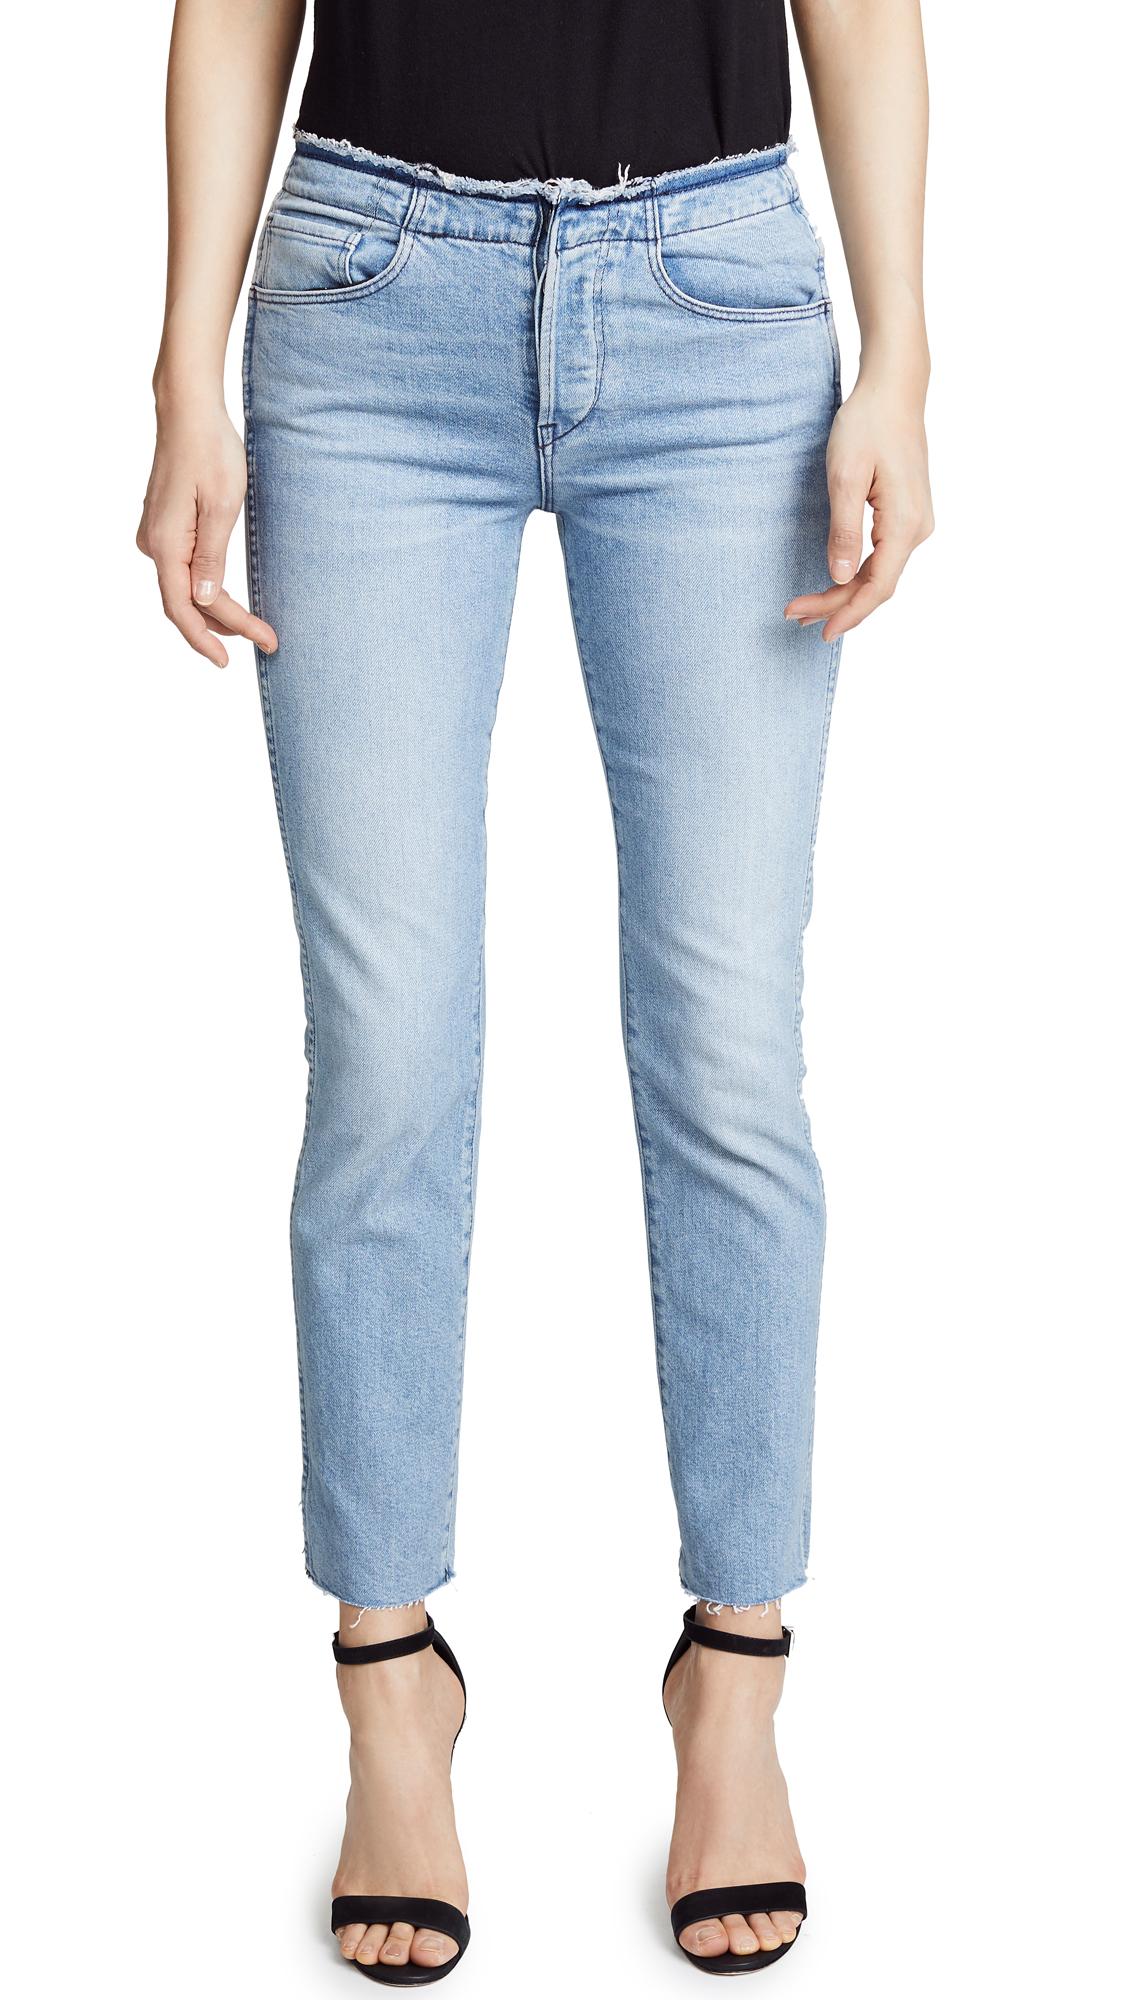 3x1 Raw Edge Shelter Slim Jeans